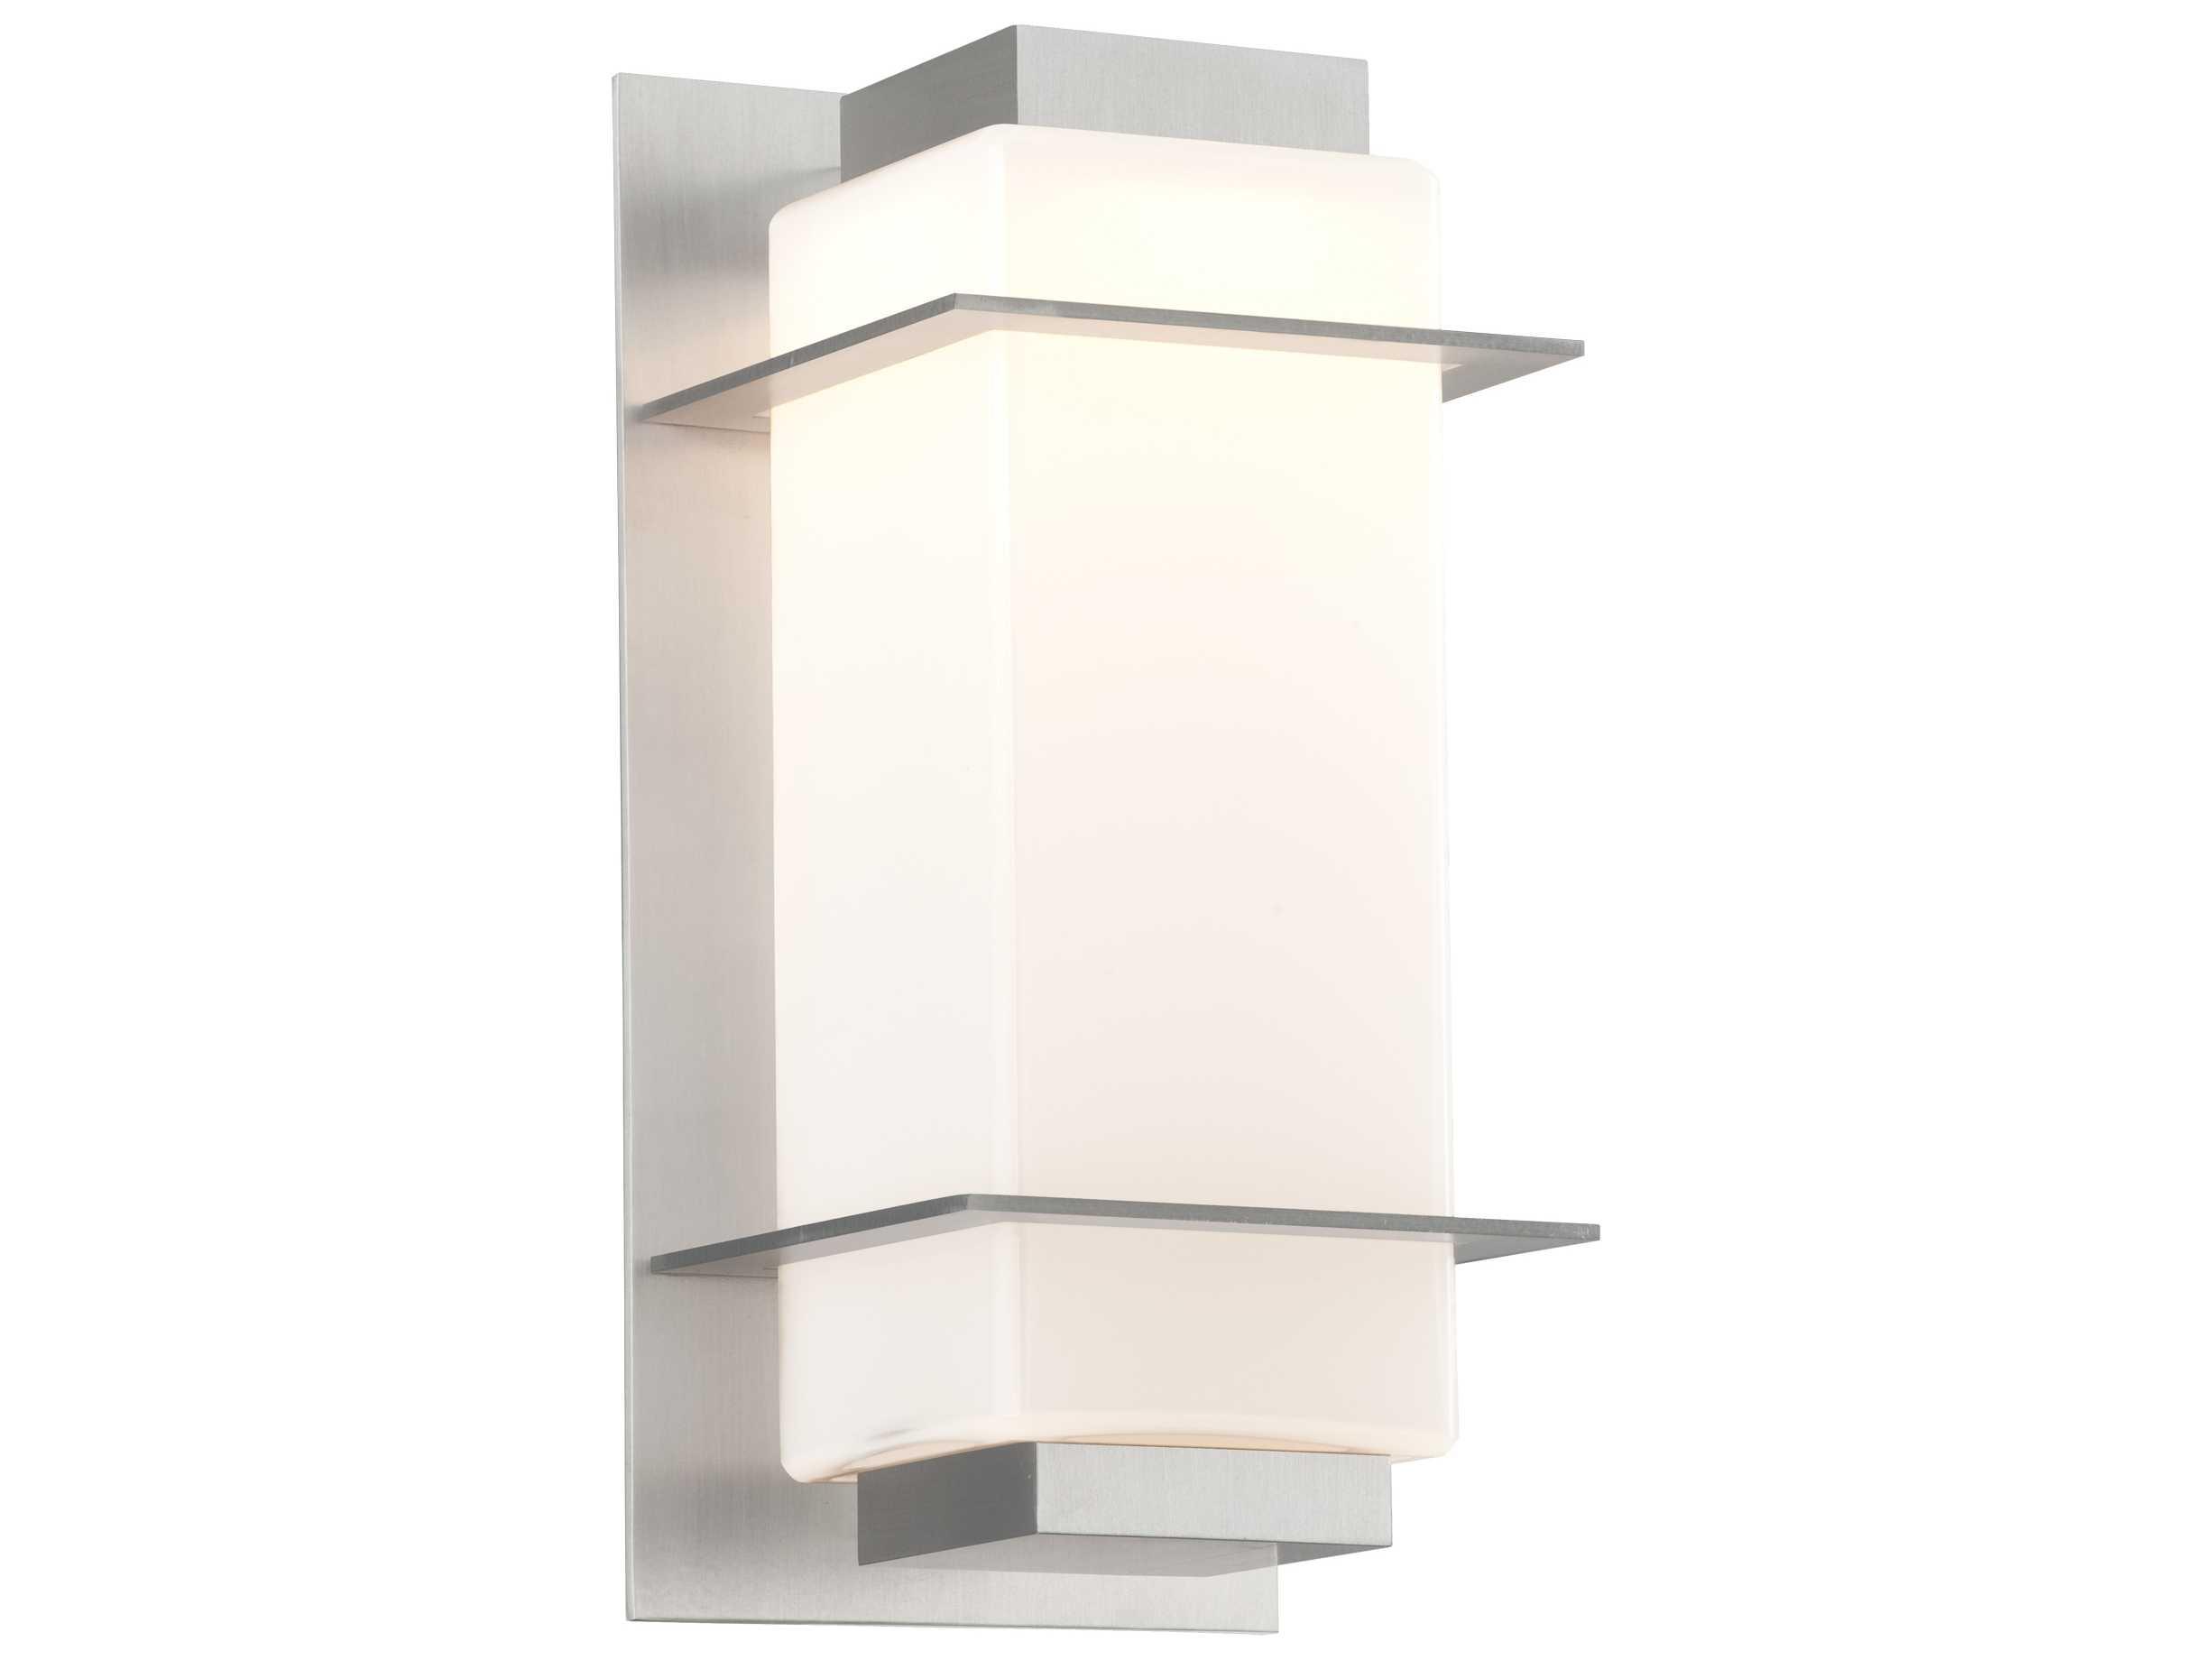 Troy Lighting Paradox Satin Aluminum Small LED Outdoor Wall Light TLBL4601SA